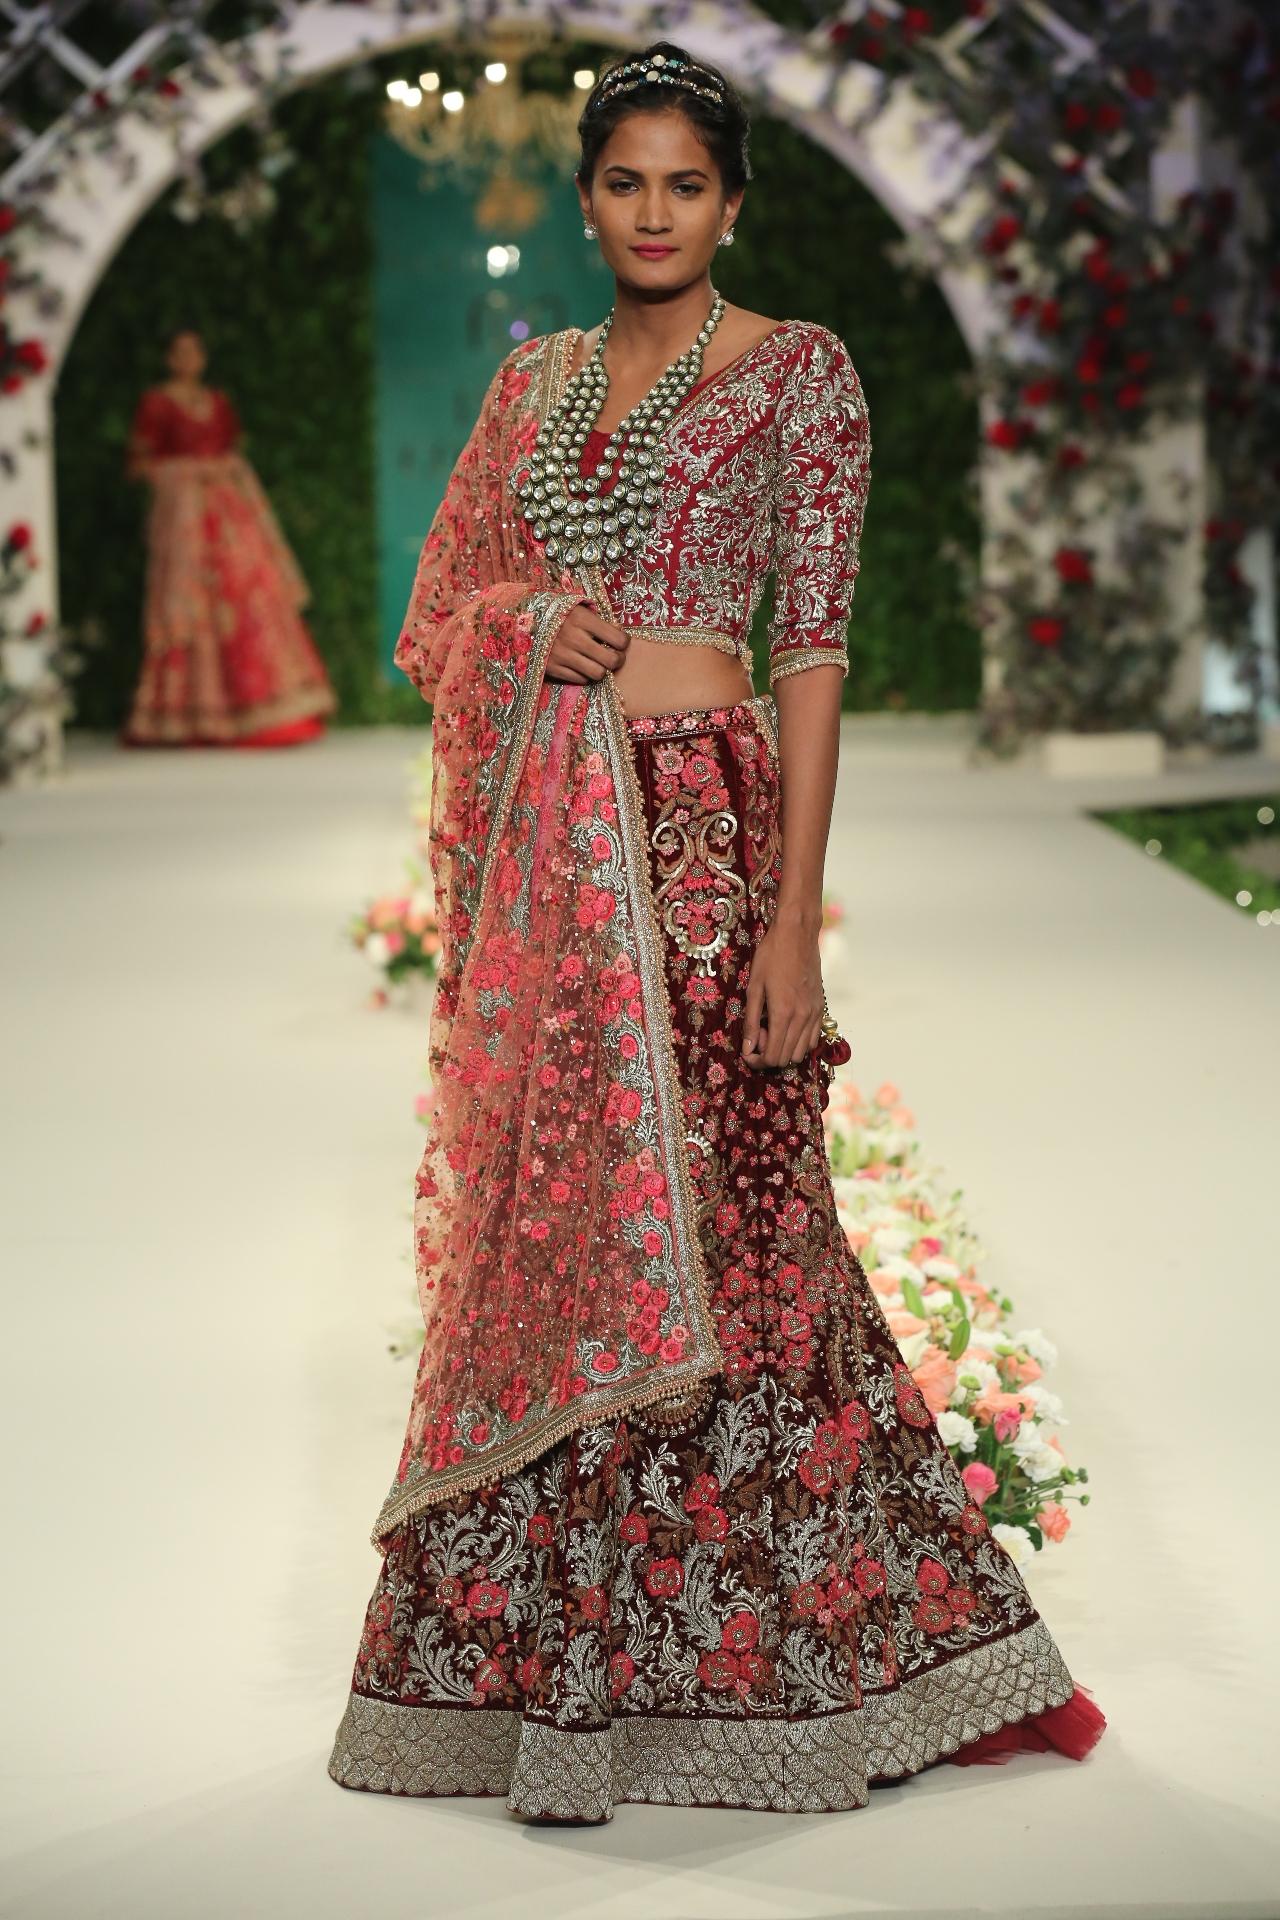 Varun Bahl 'Vintage Garden' - FDCI India Couture Week 2016